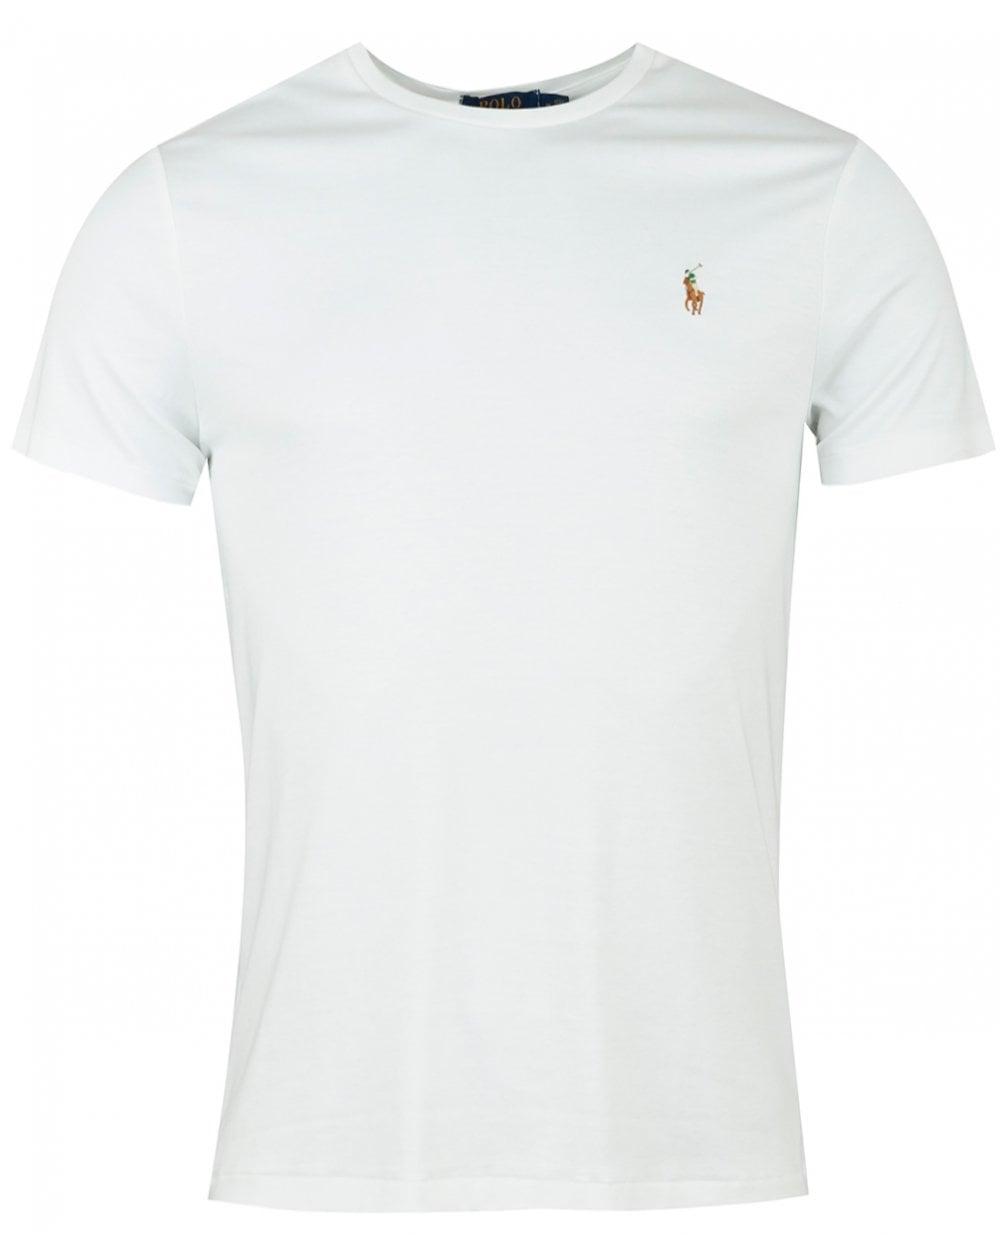 custom-fit-pima-cotton-crew-neck-t-shirt-p37251-2683046_image